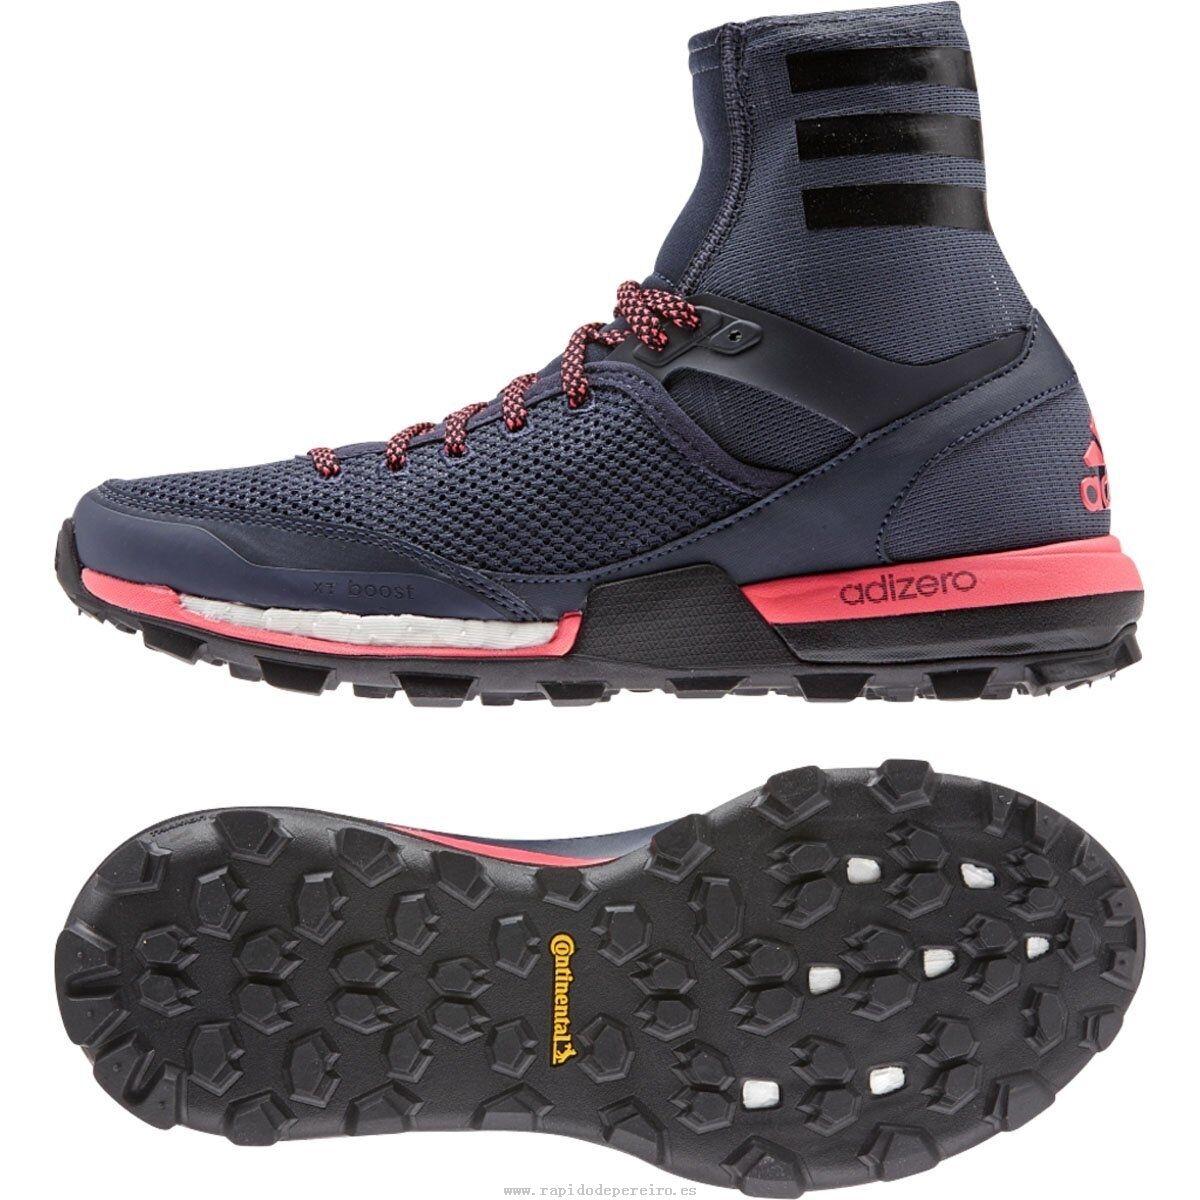 Mujer adidas adizero XT Boost running zapatos cómodos baratos de zapatos de mujer zapatos de baratos mujer 21c970